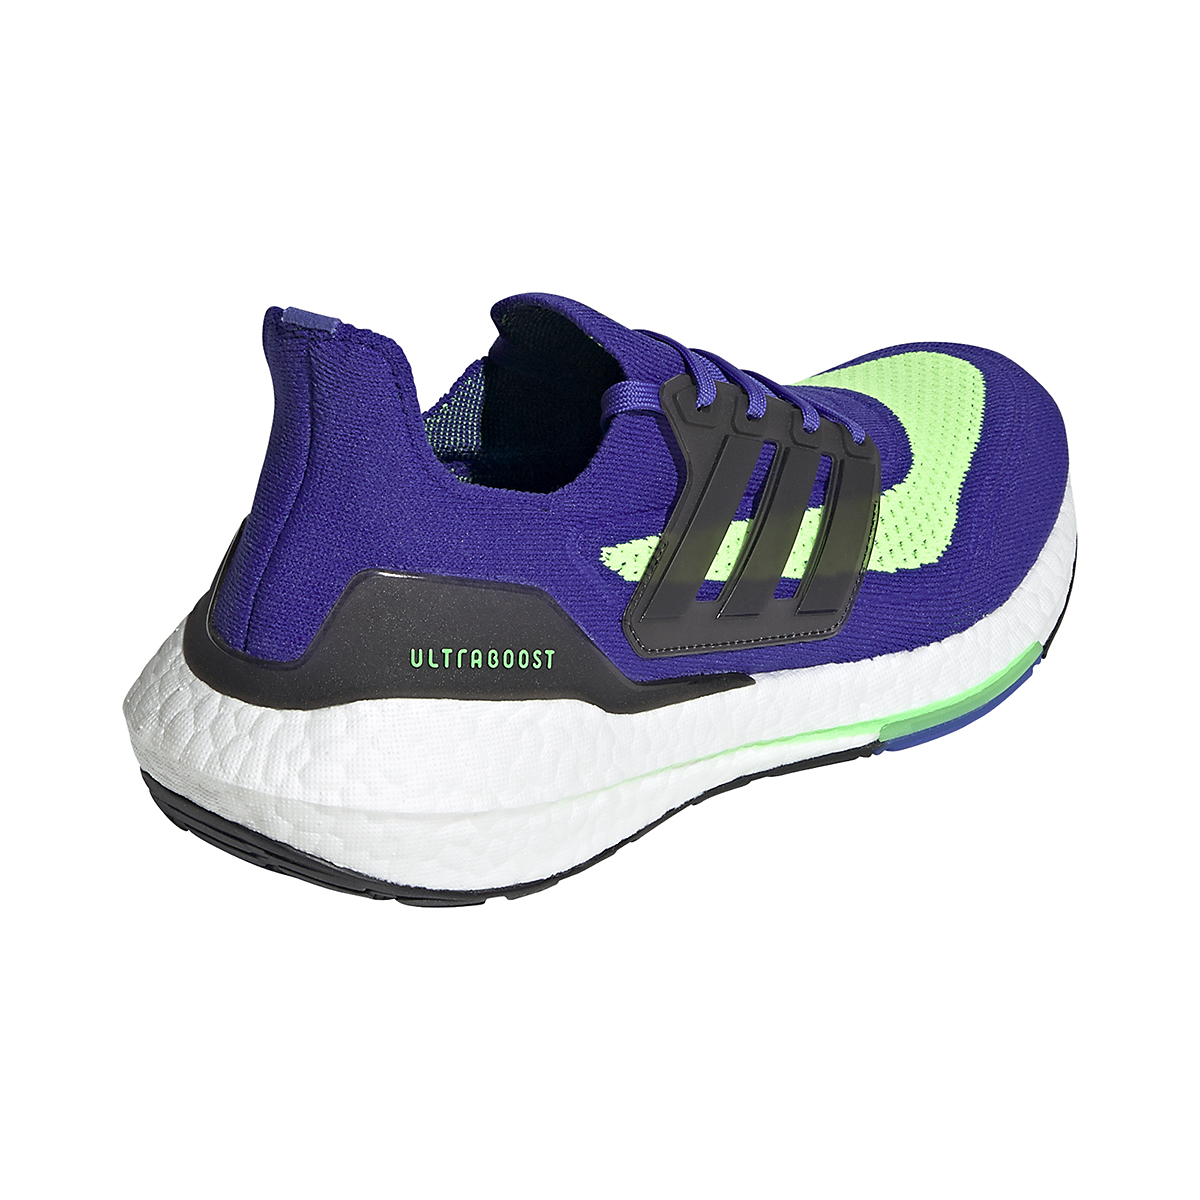 Men's Adidas UltraBOOST 21 Running Shoe - Color: Sonic Ink/Core Black/Screaming Green - Size: 6 - Width: Regular, Sonic Ink/Core Black/Screaming Green, large, image 5